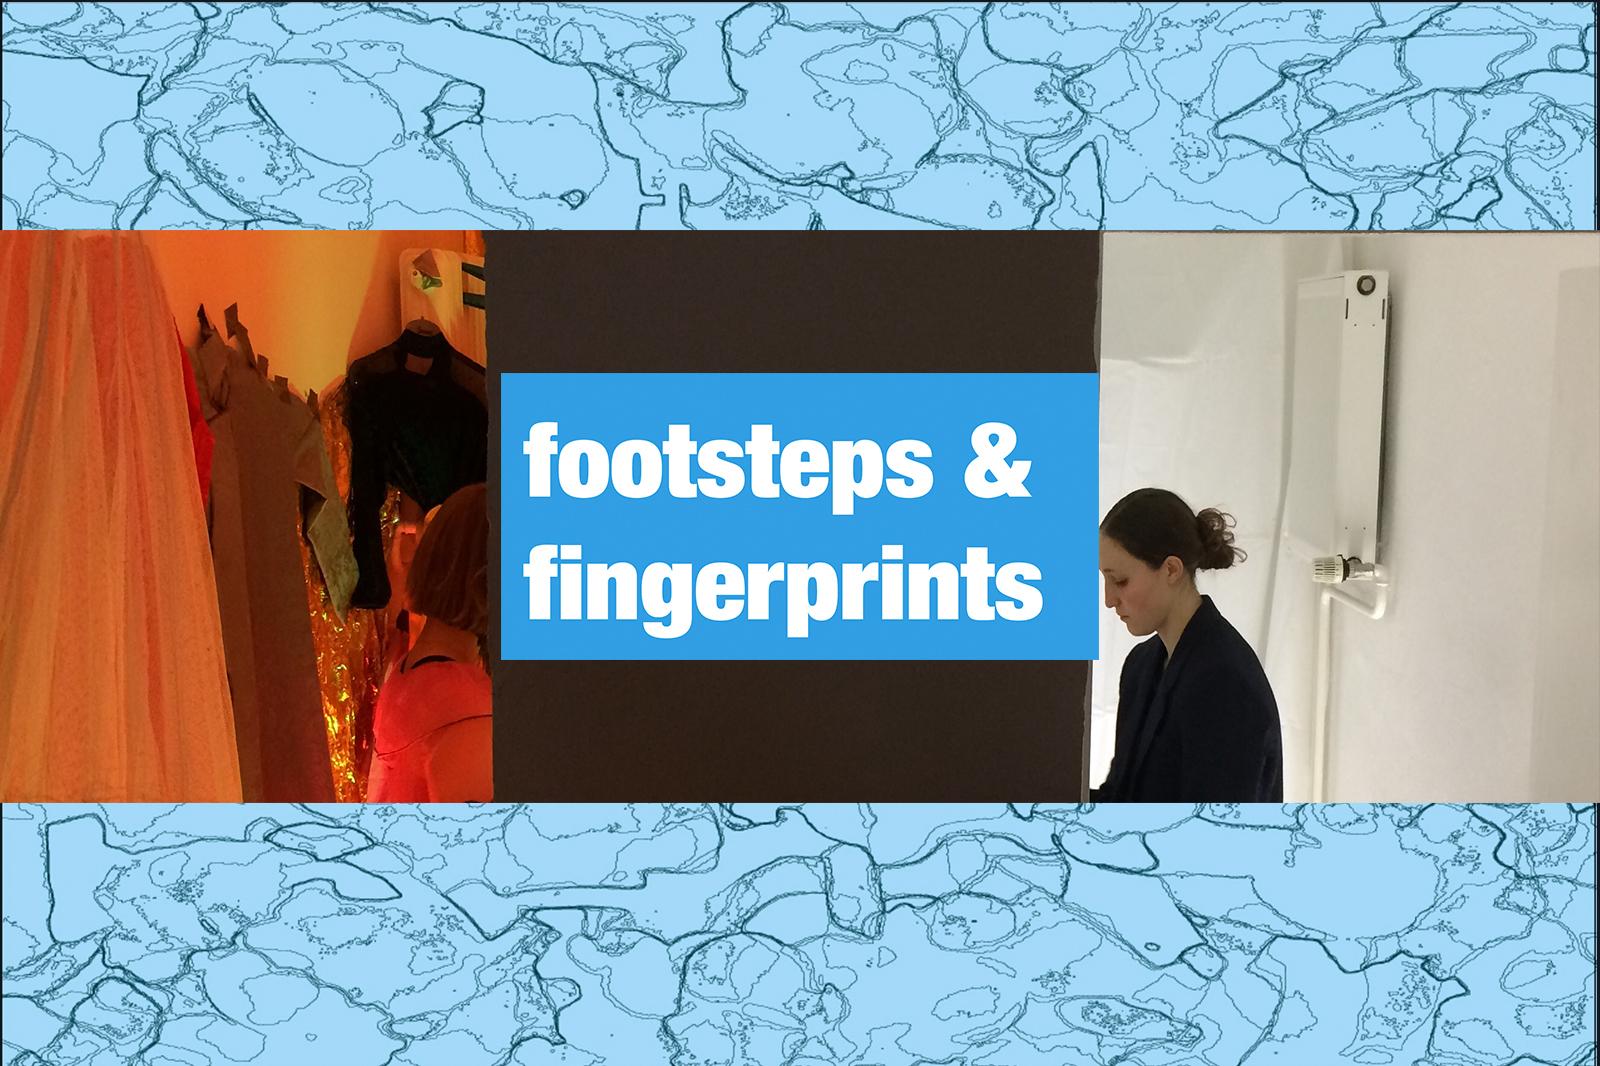 footsteps-and-fingerprints_spaces